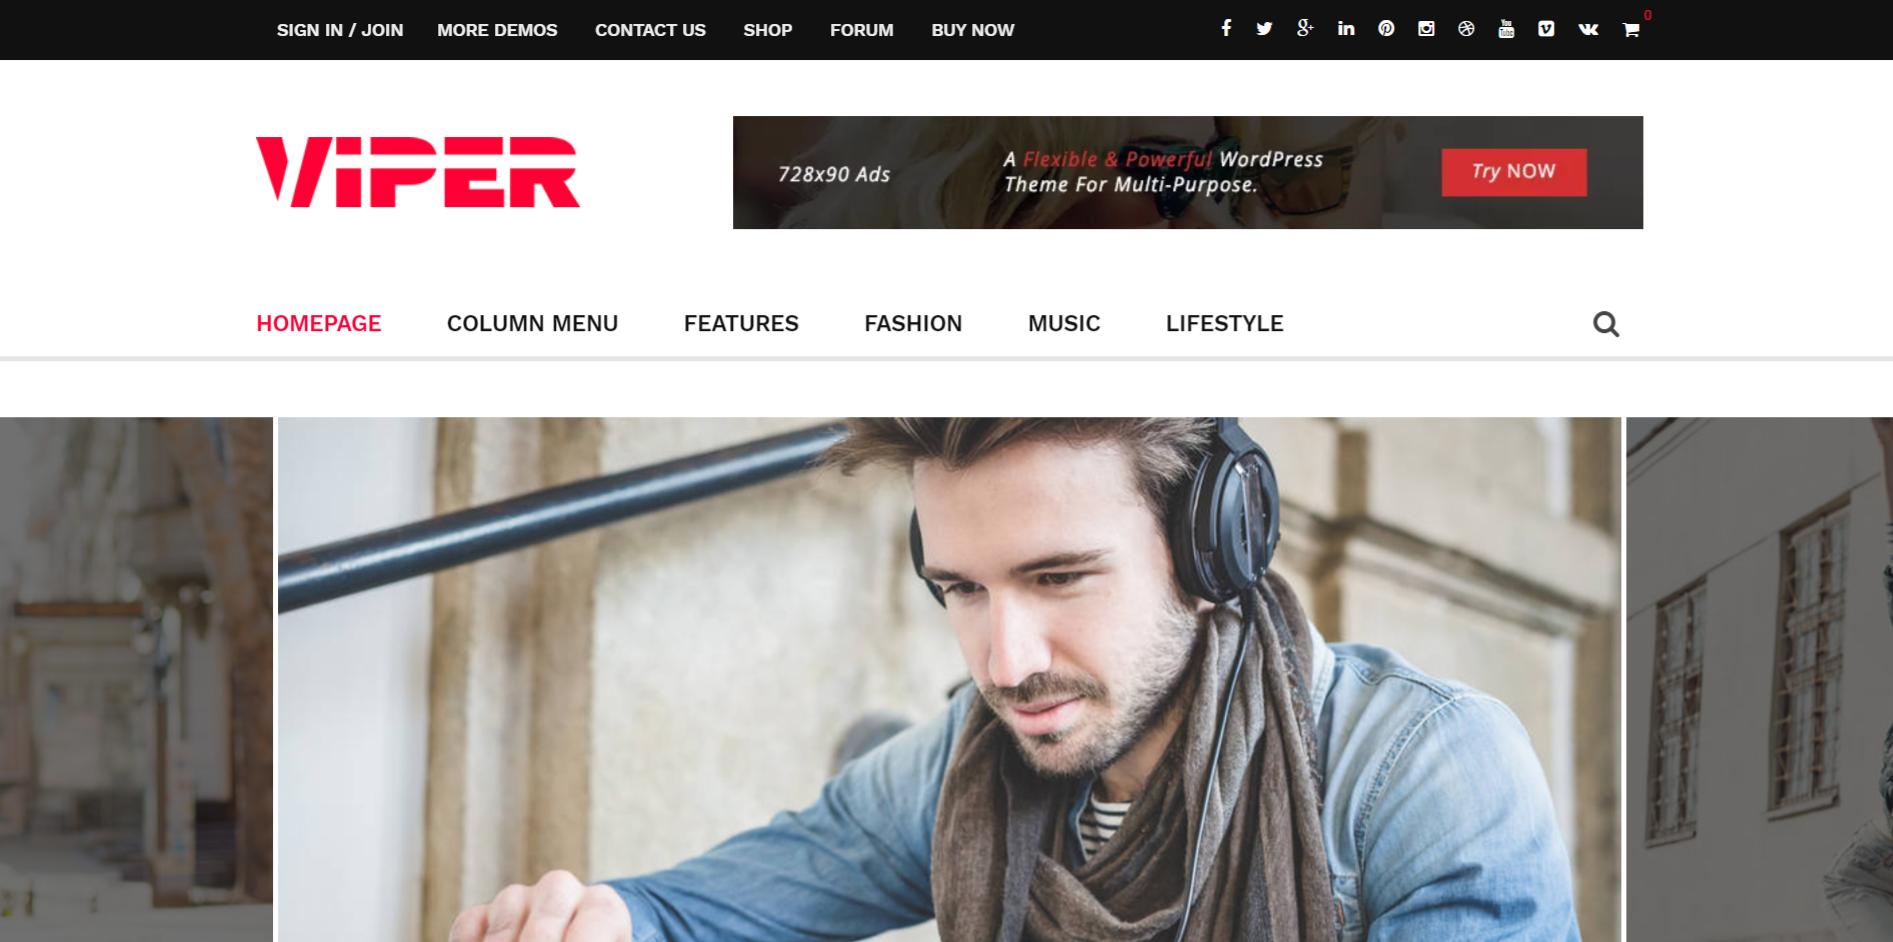 Viper WordPress theme